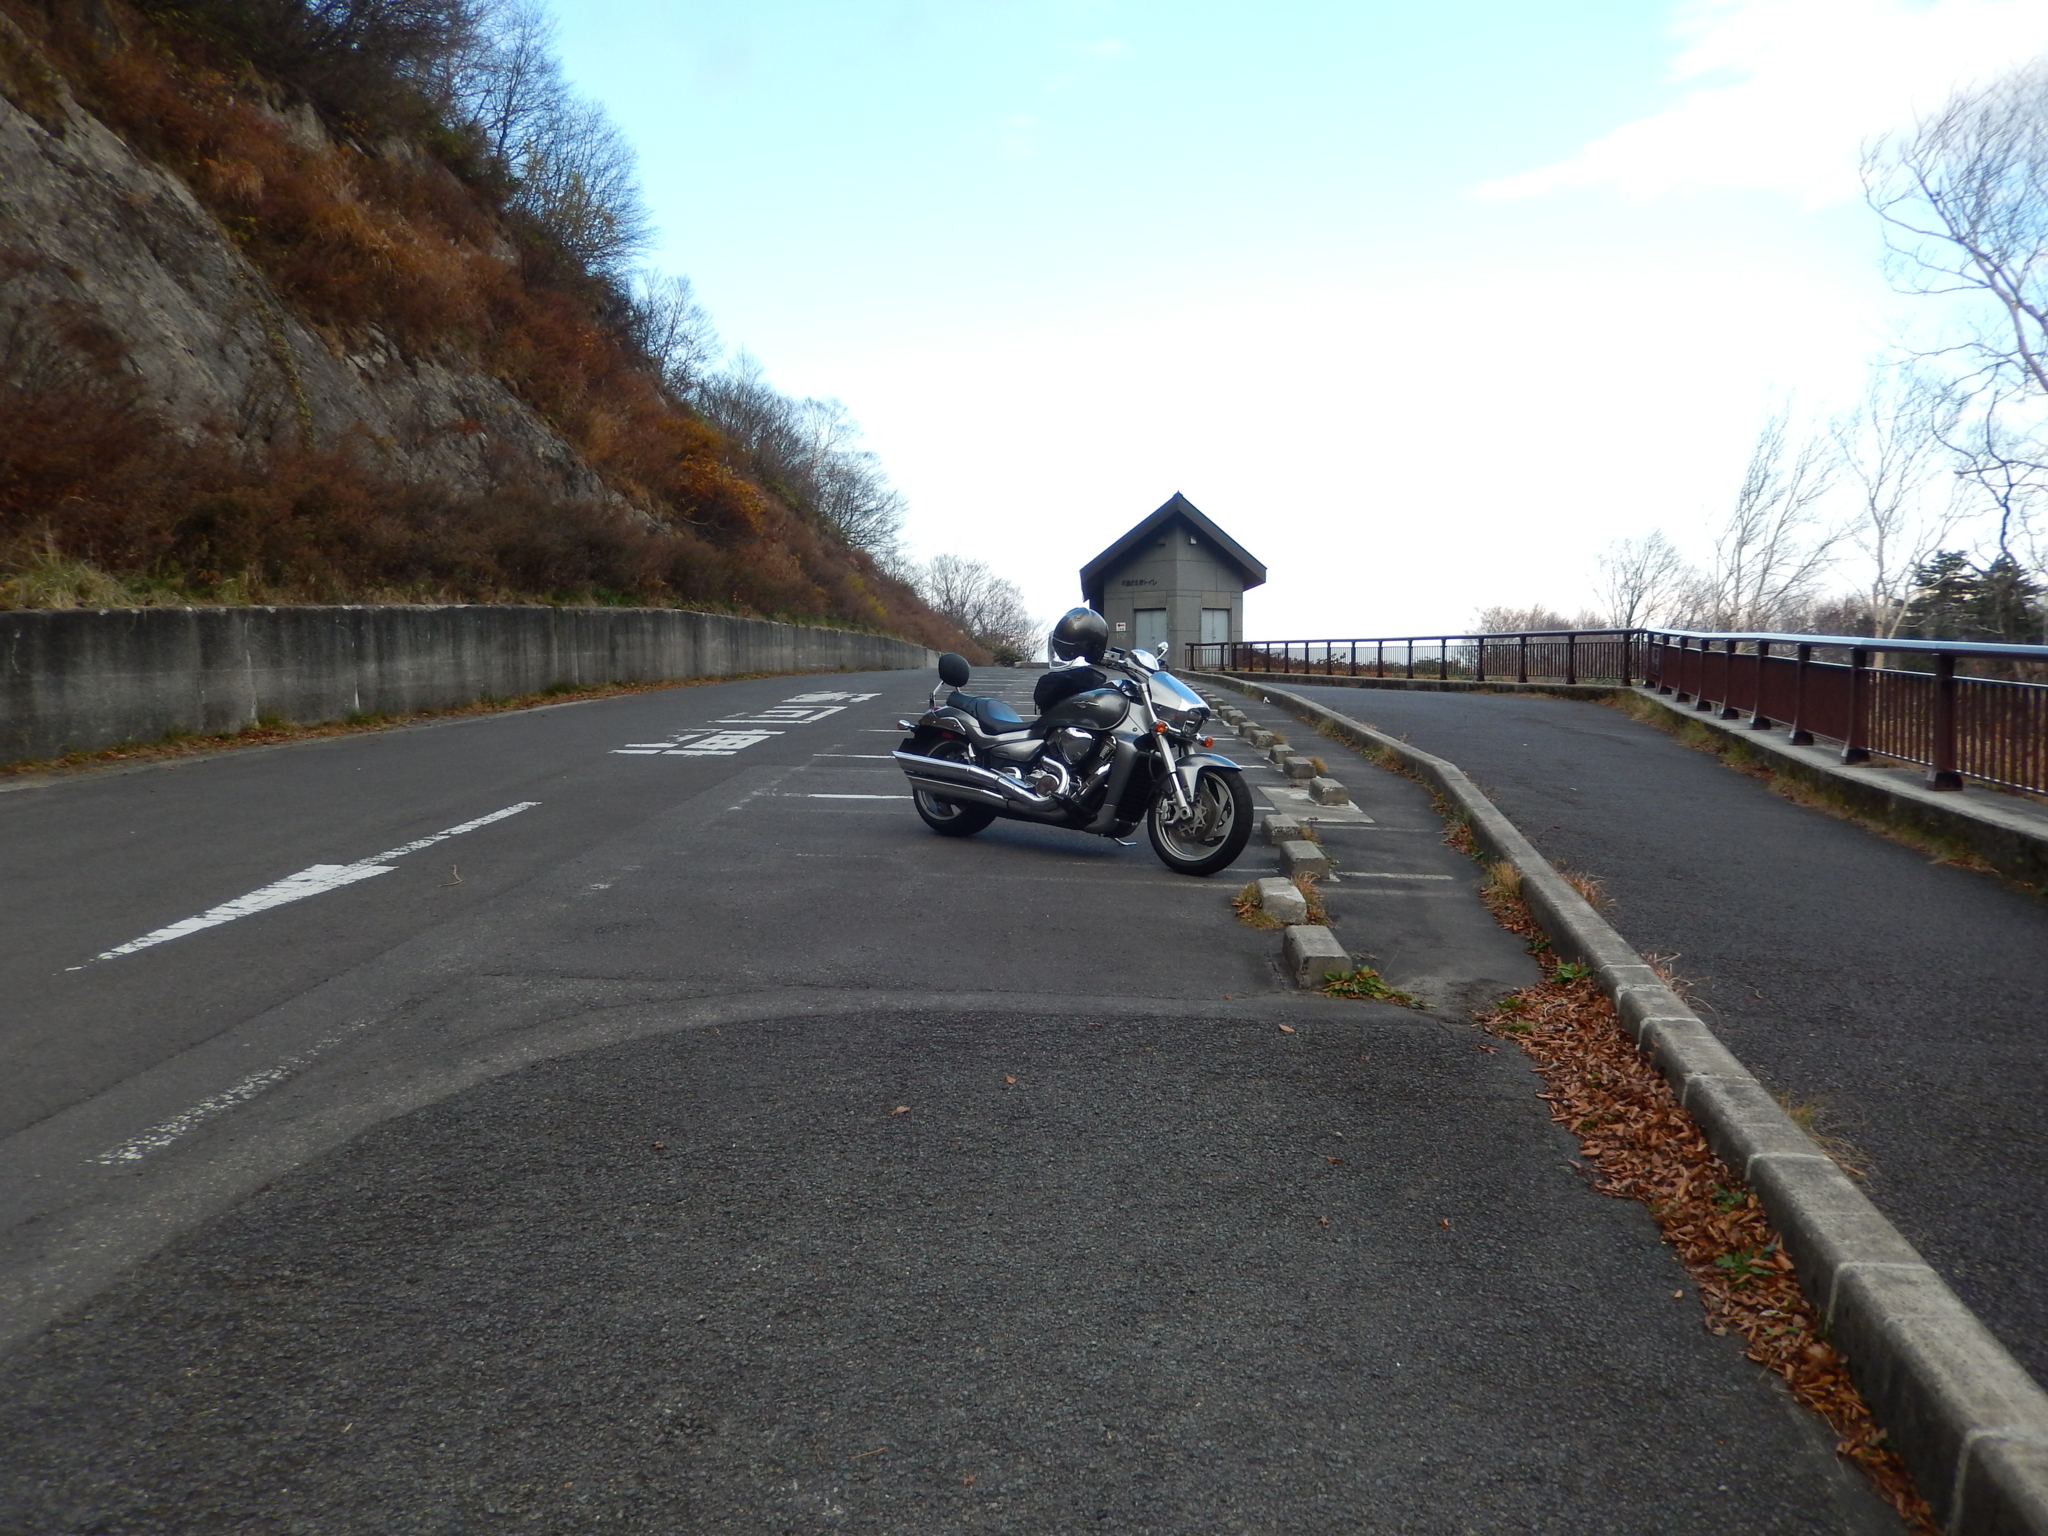 f:id:ToshUeno:20151106143350j:plain